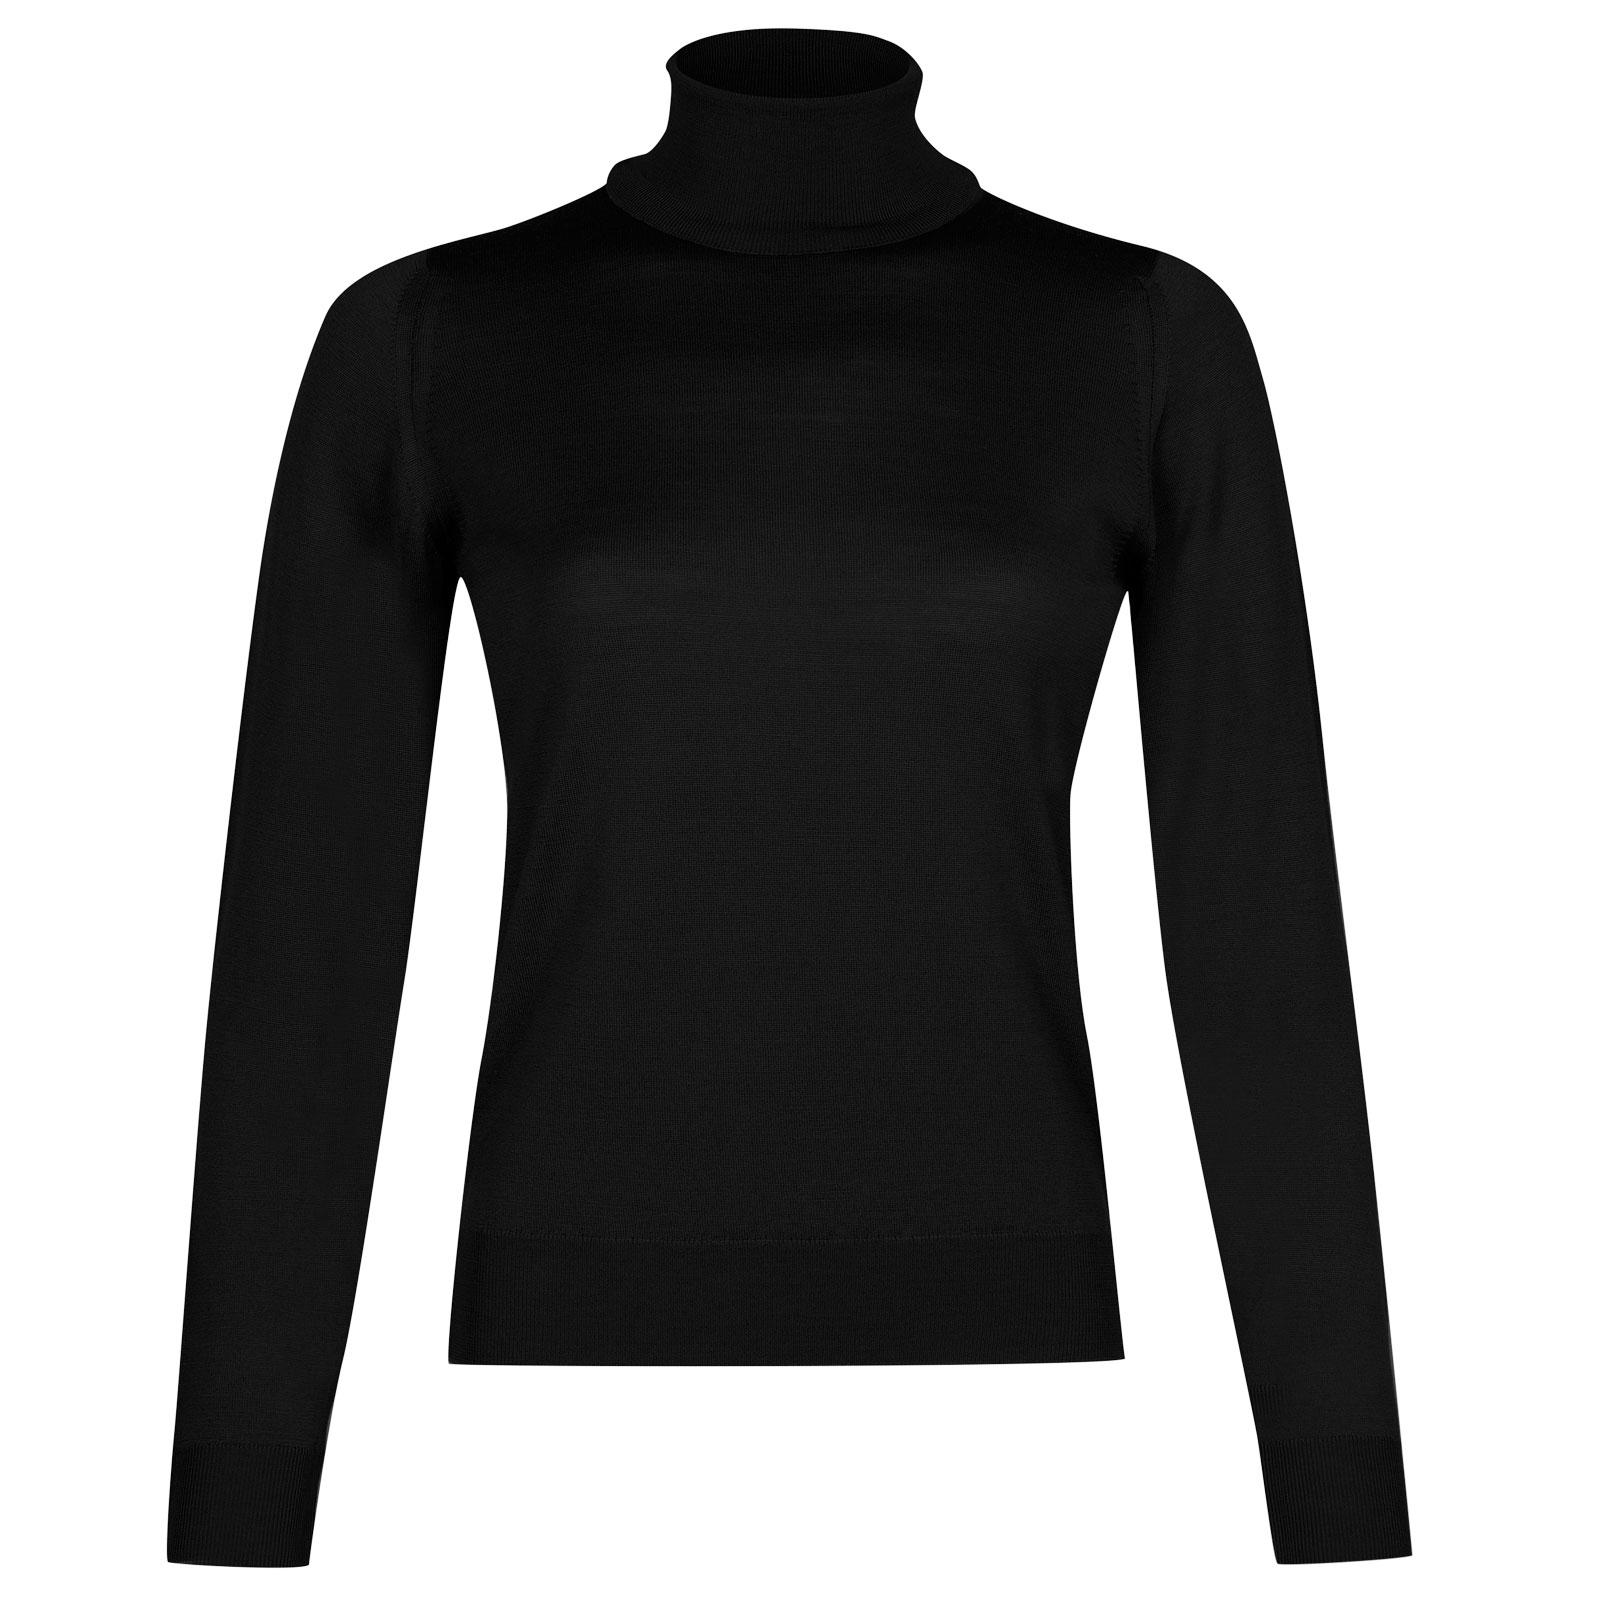 John Smedley siena Merino Wool Sweater in Black-M